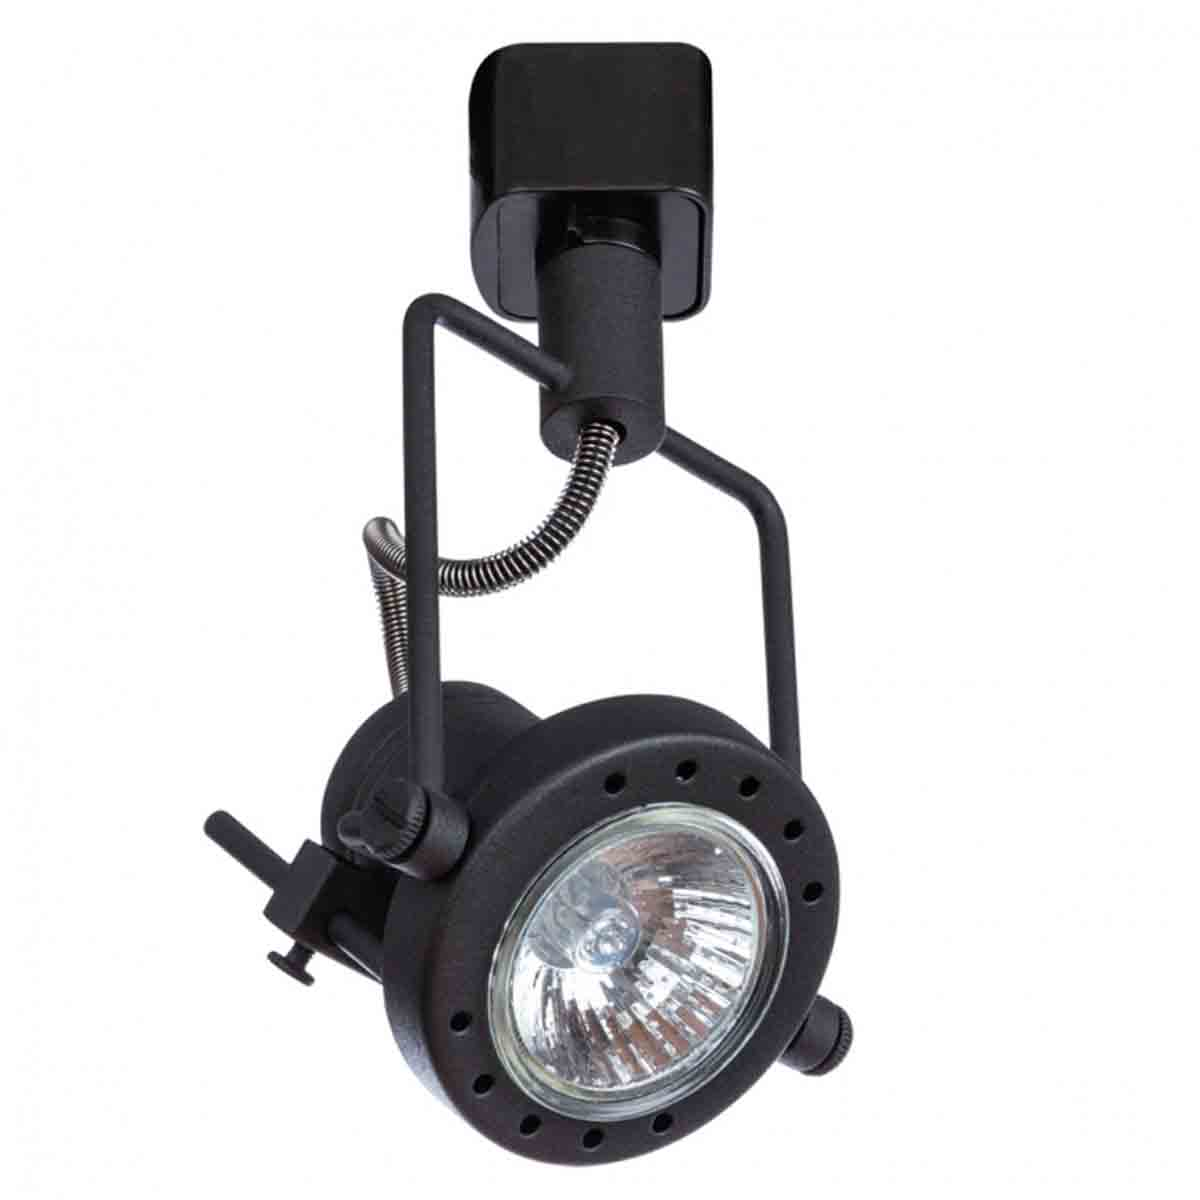 цена на Спот Arte Lamp A4300PL-1BK 4300